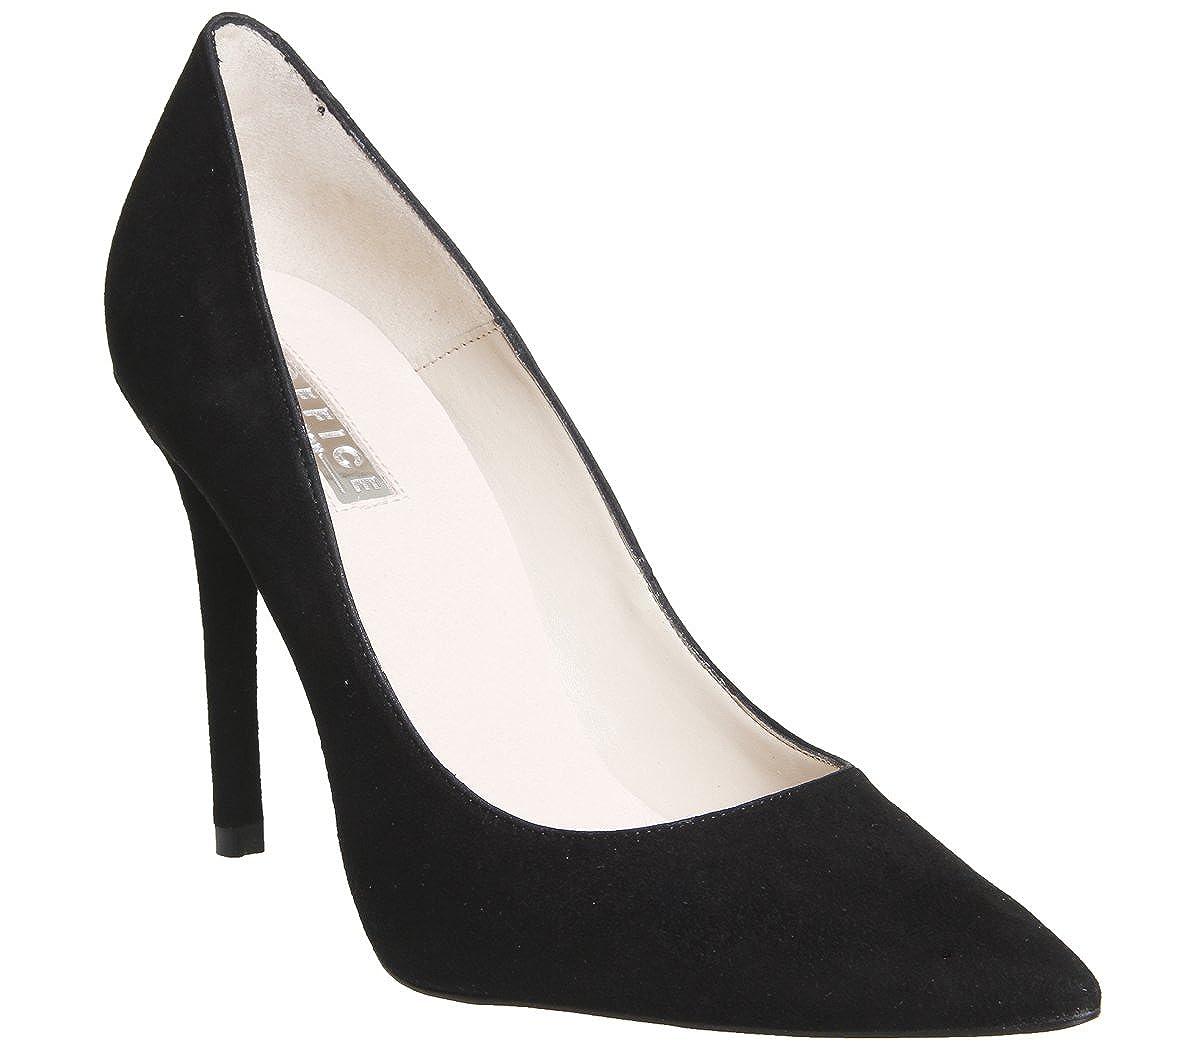 a782a779224 Office Hattie Point Court Heels: Amazon.co.uk: Shoes & Bags